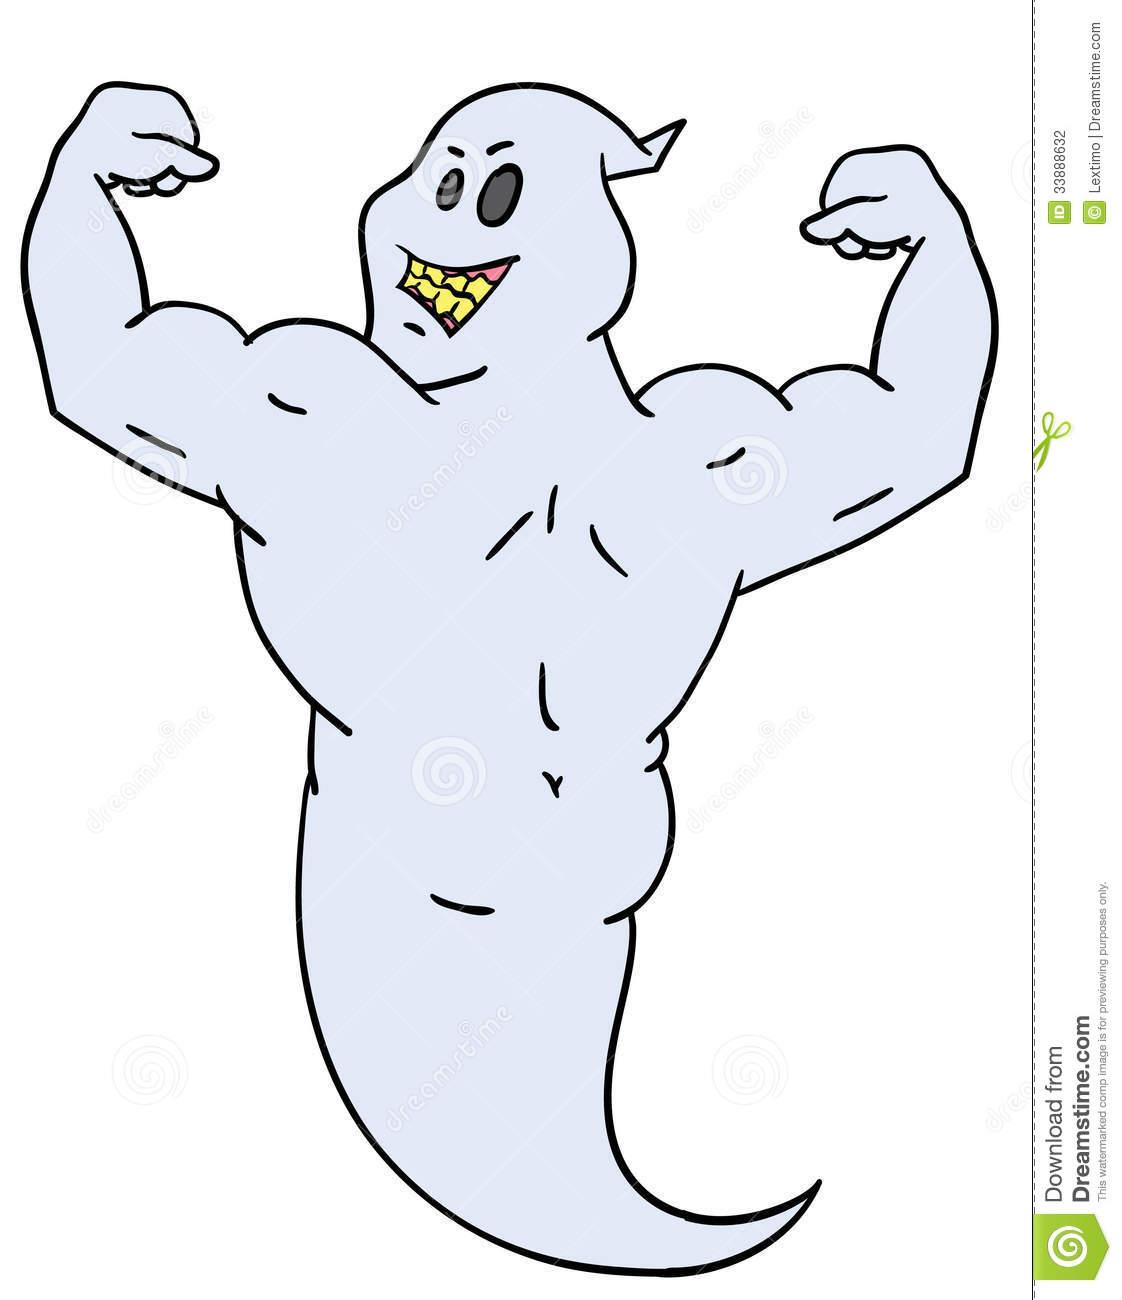 bodybuilder-ghost-funny-making-bodybuild